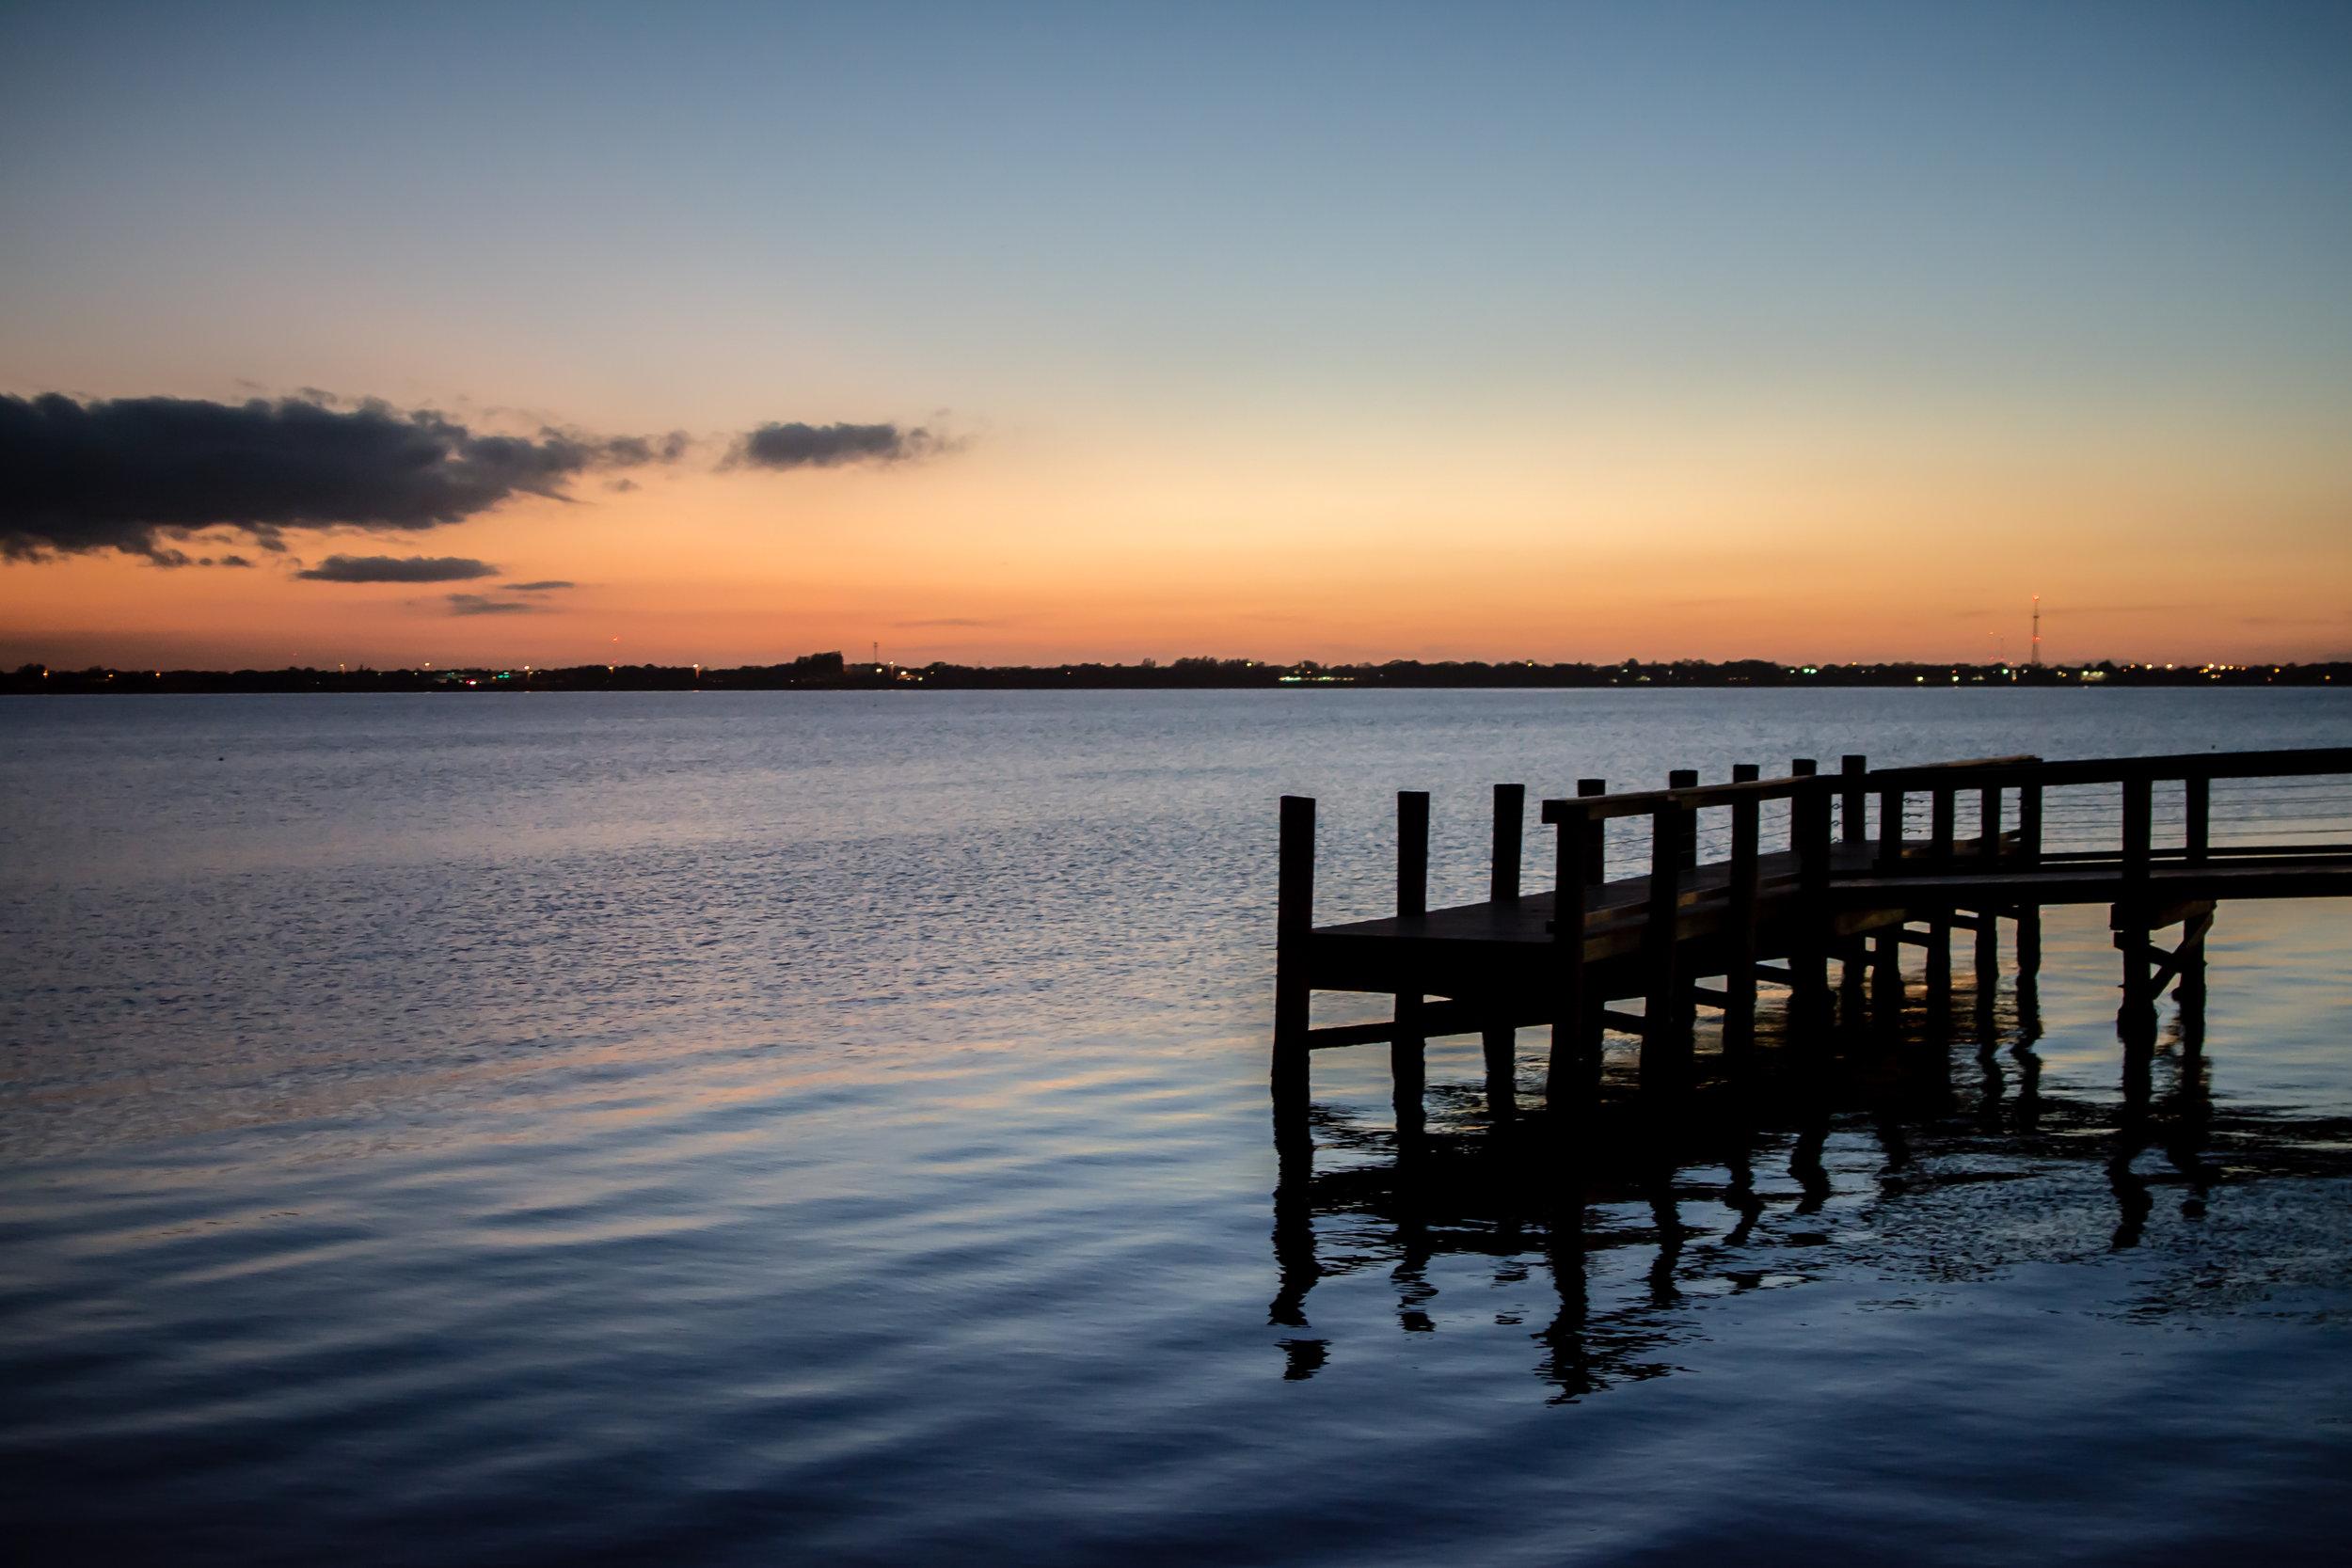 melbourne-beach-sunsets-yanitza-ninett-photography-8